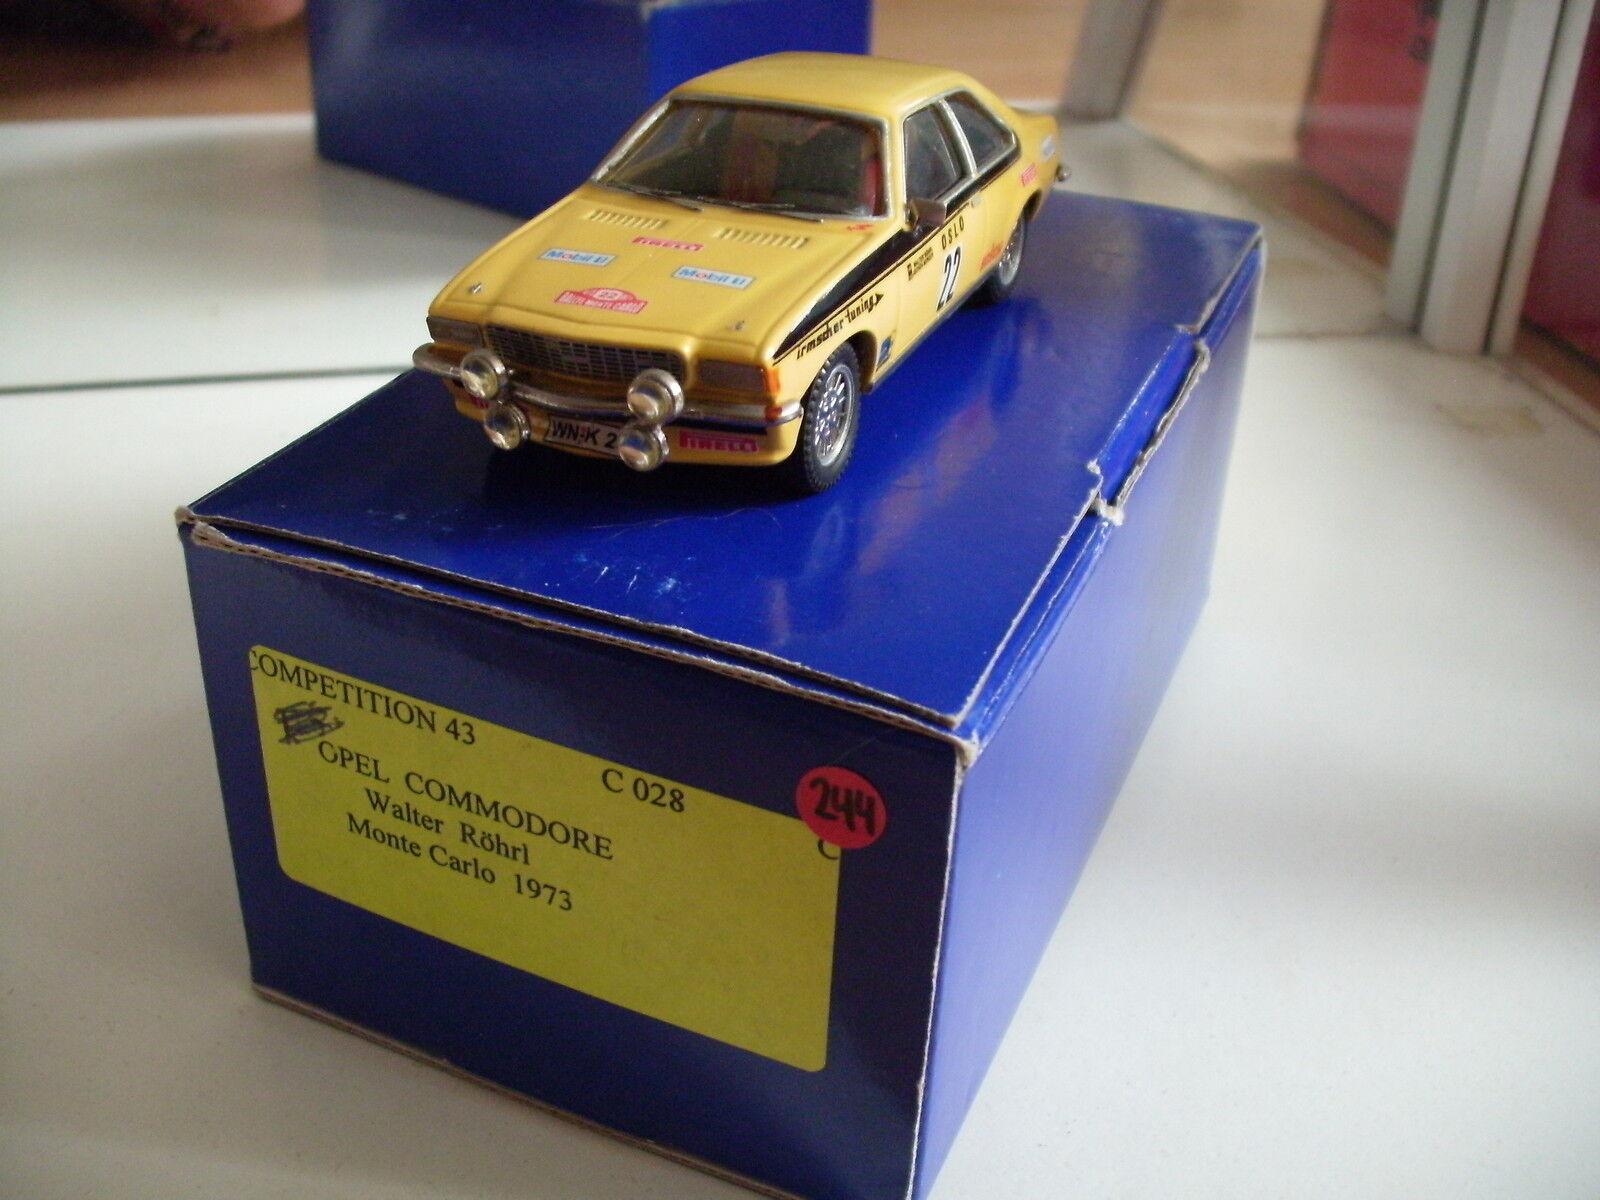 Hand Built Model Competition 43 Opel Commodore Monte Carlo 1973 in giallo 1:43